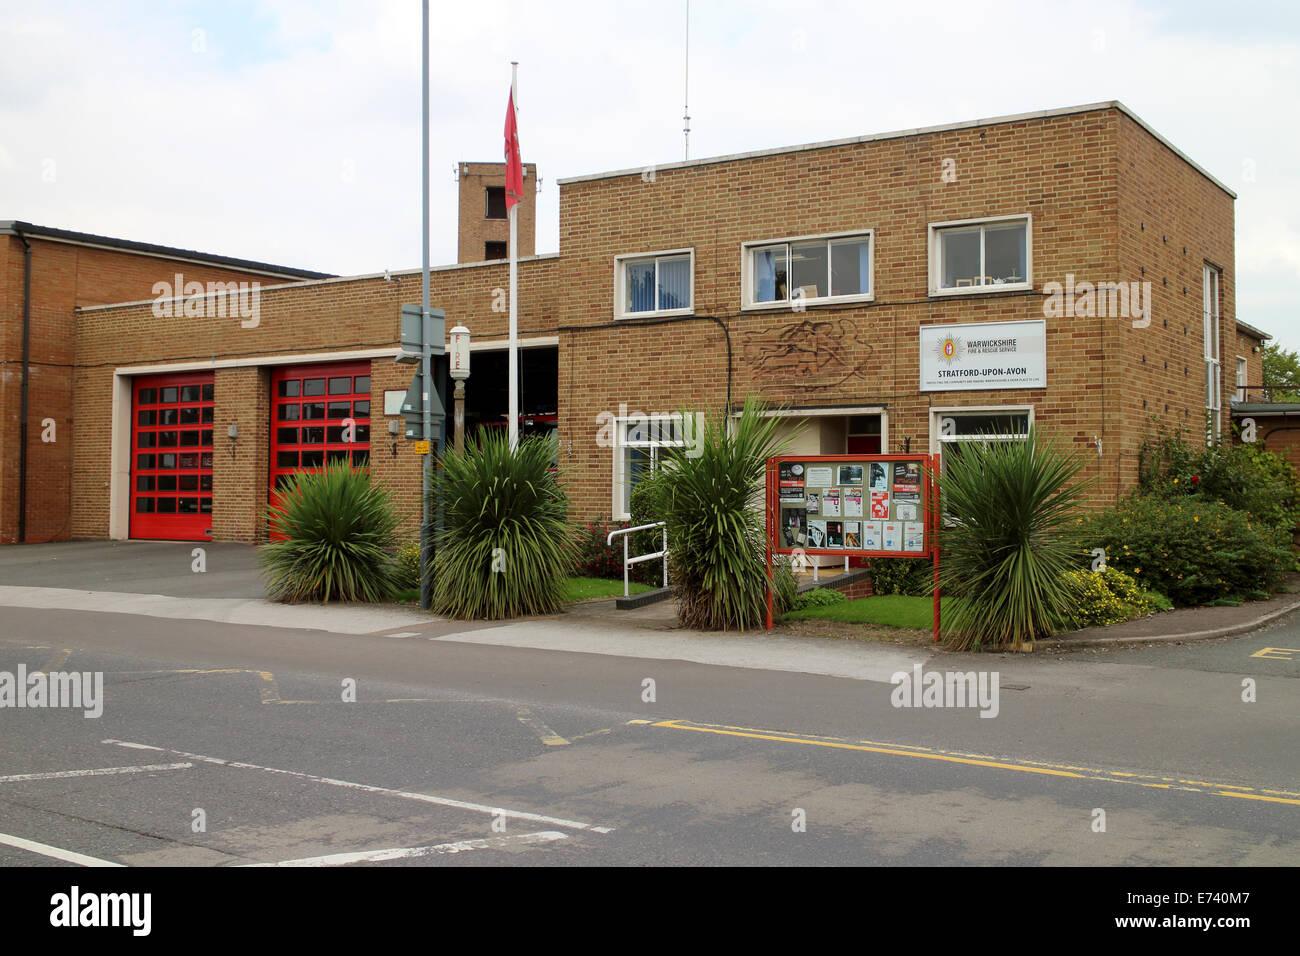 Stratford-upon-Avon fire station, Warwickshire, UK Stock